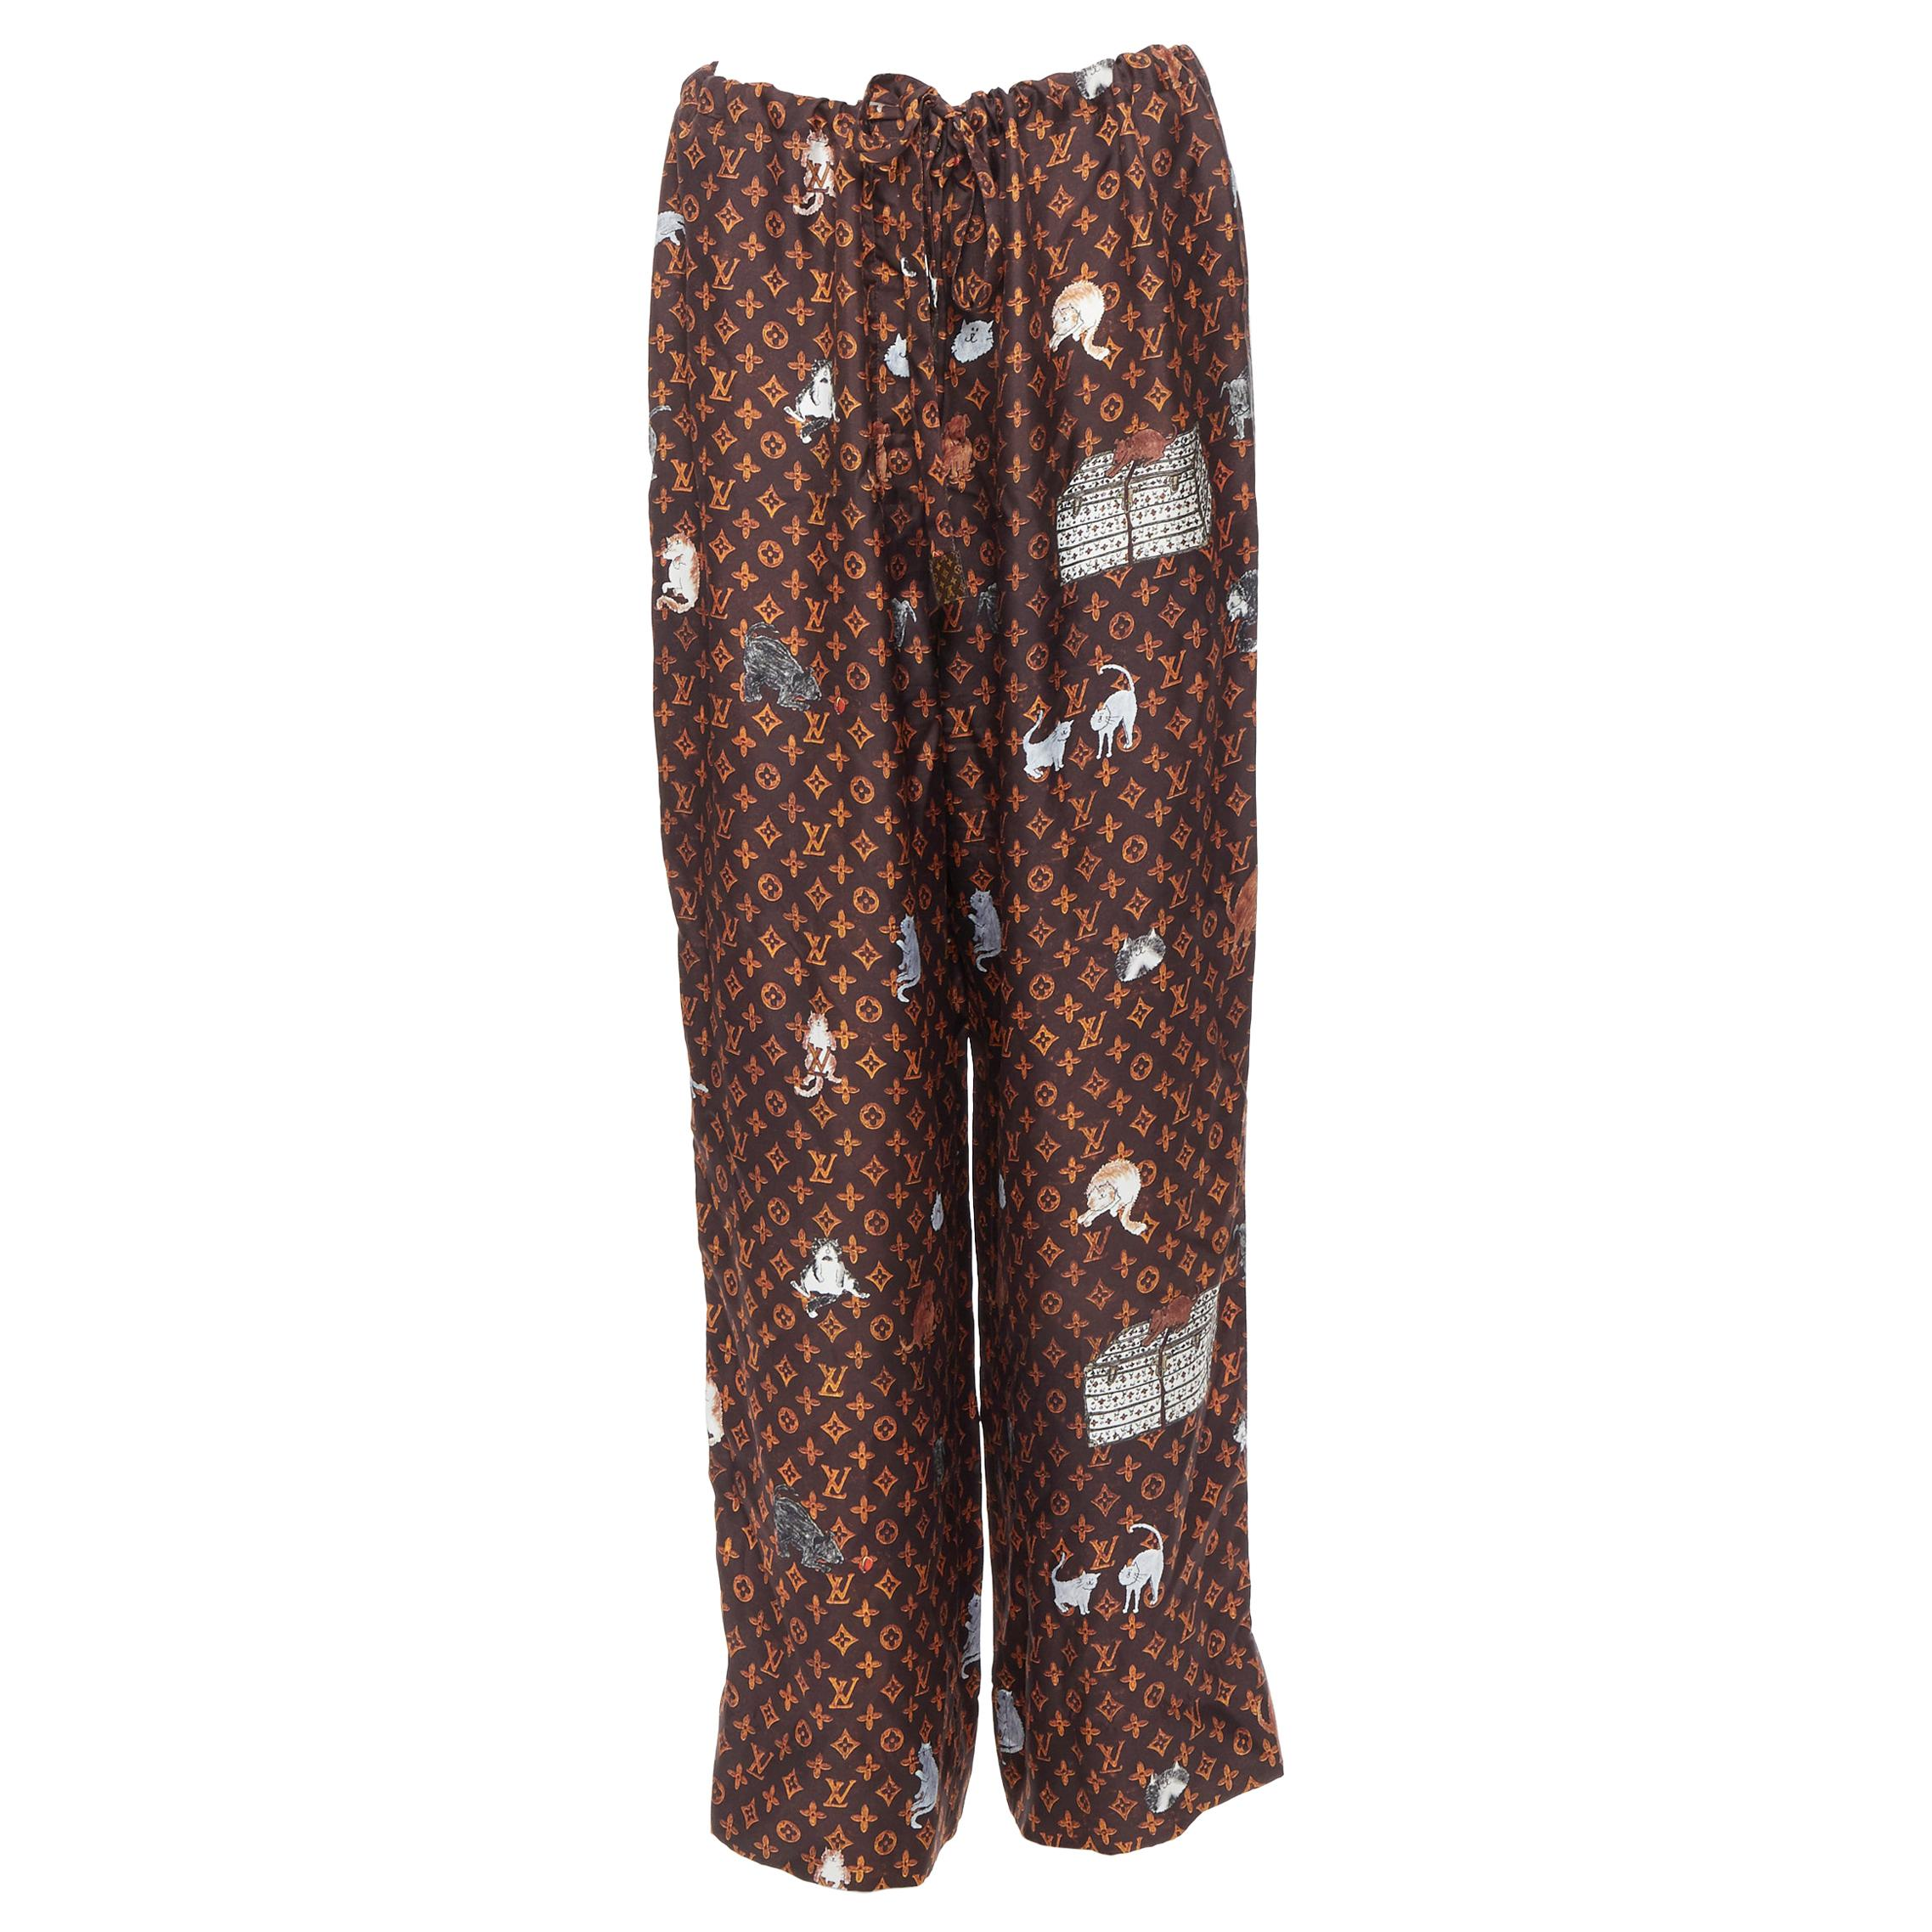 LOUIS VUITTON Rare 2019 Coddington Catagram monogram silk pajama pants FR44 XL